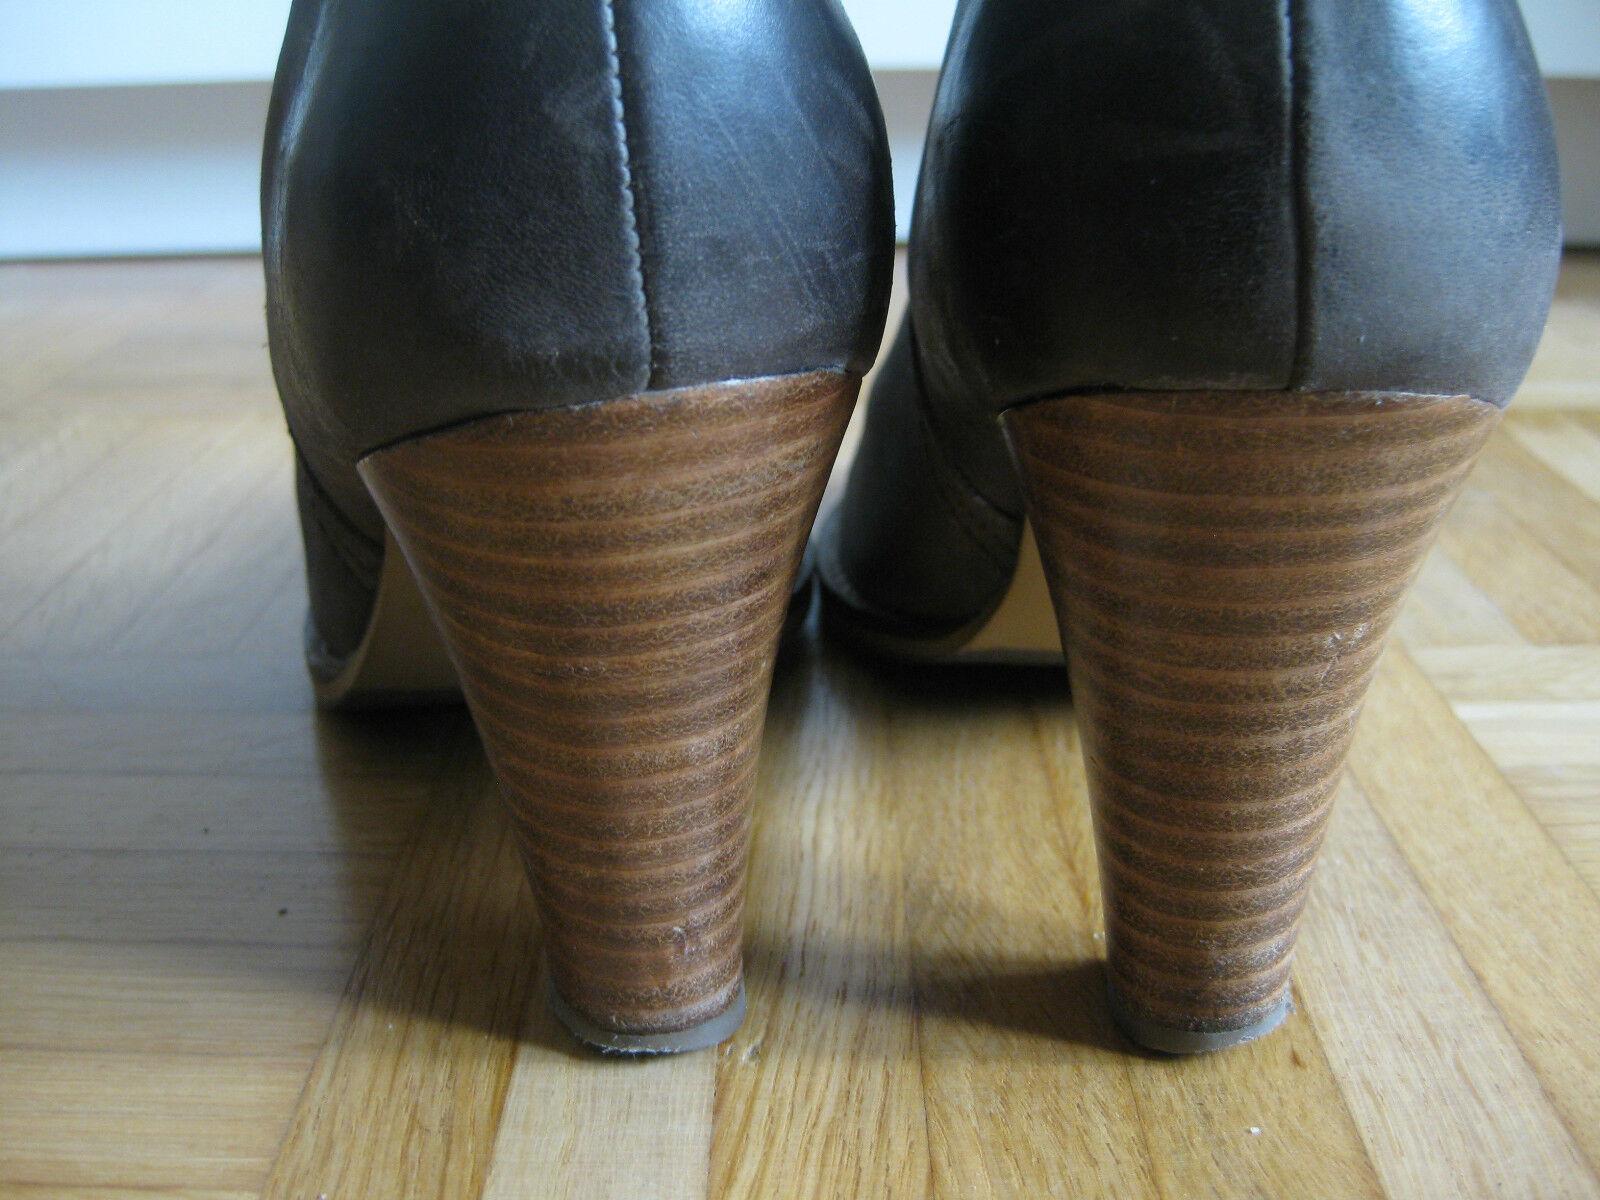 Lederstiefel Oxmox braun / Glattleder taupe 37 echtes Leder Glattleder / Damenstiefel Winter eae407